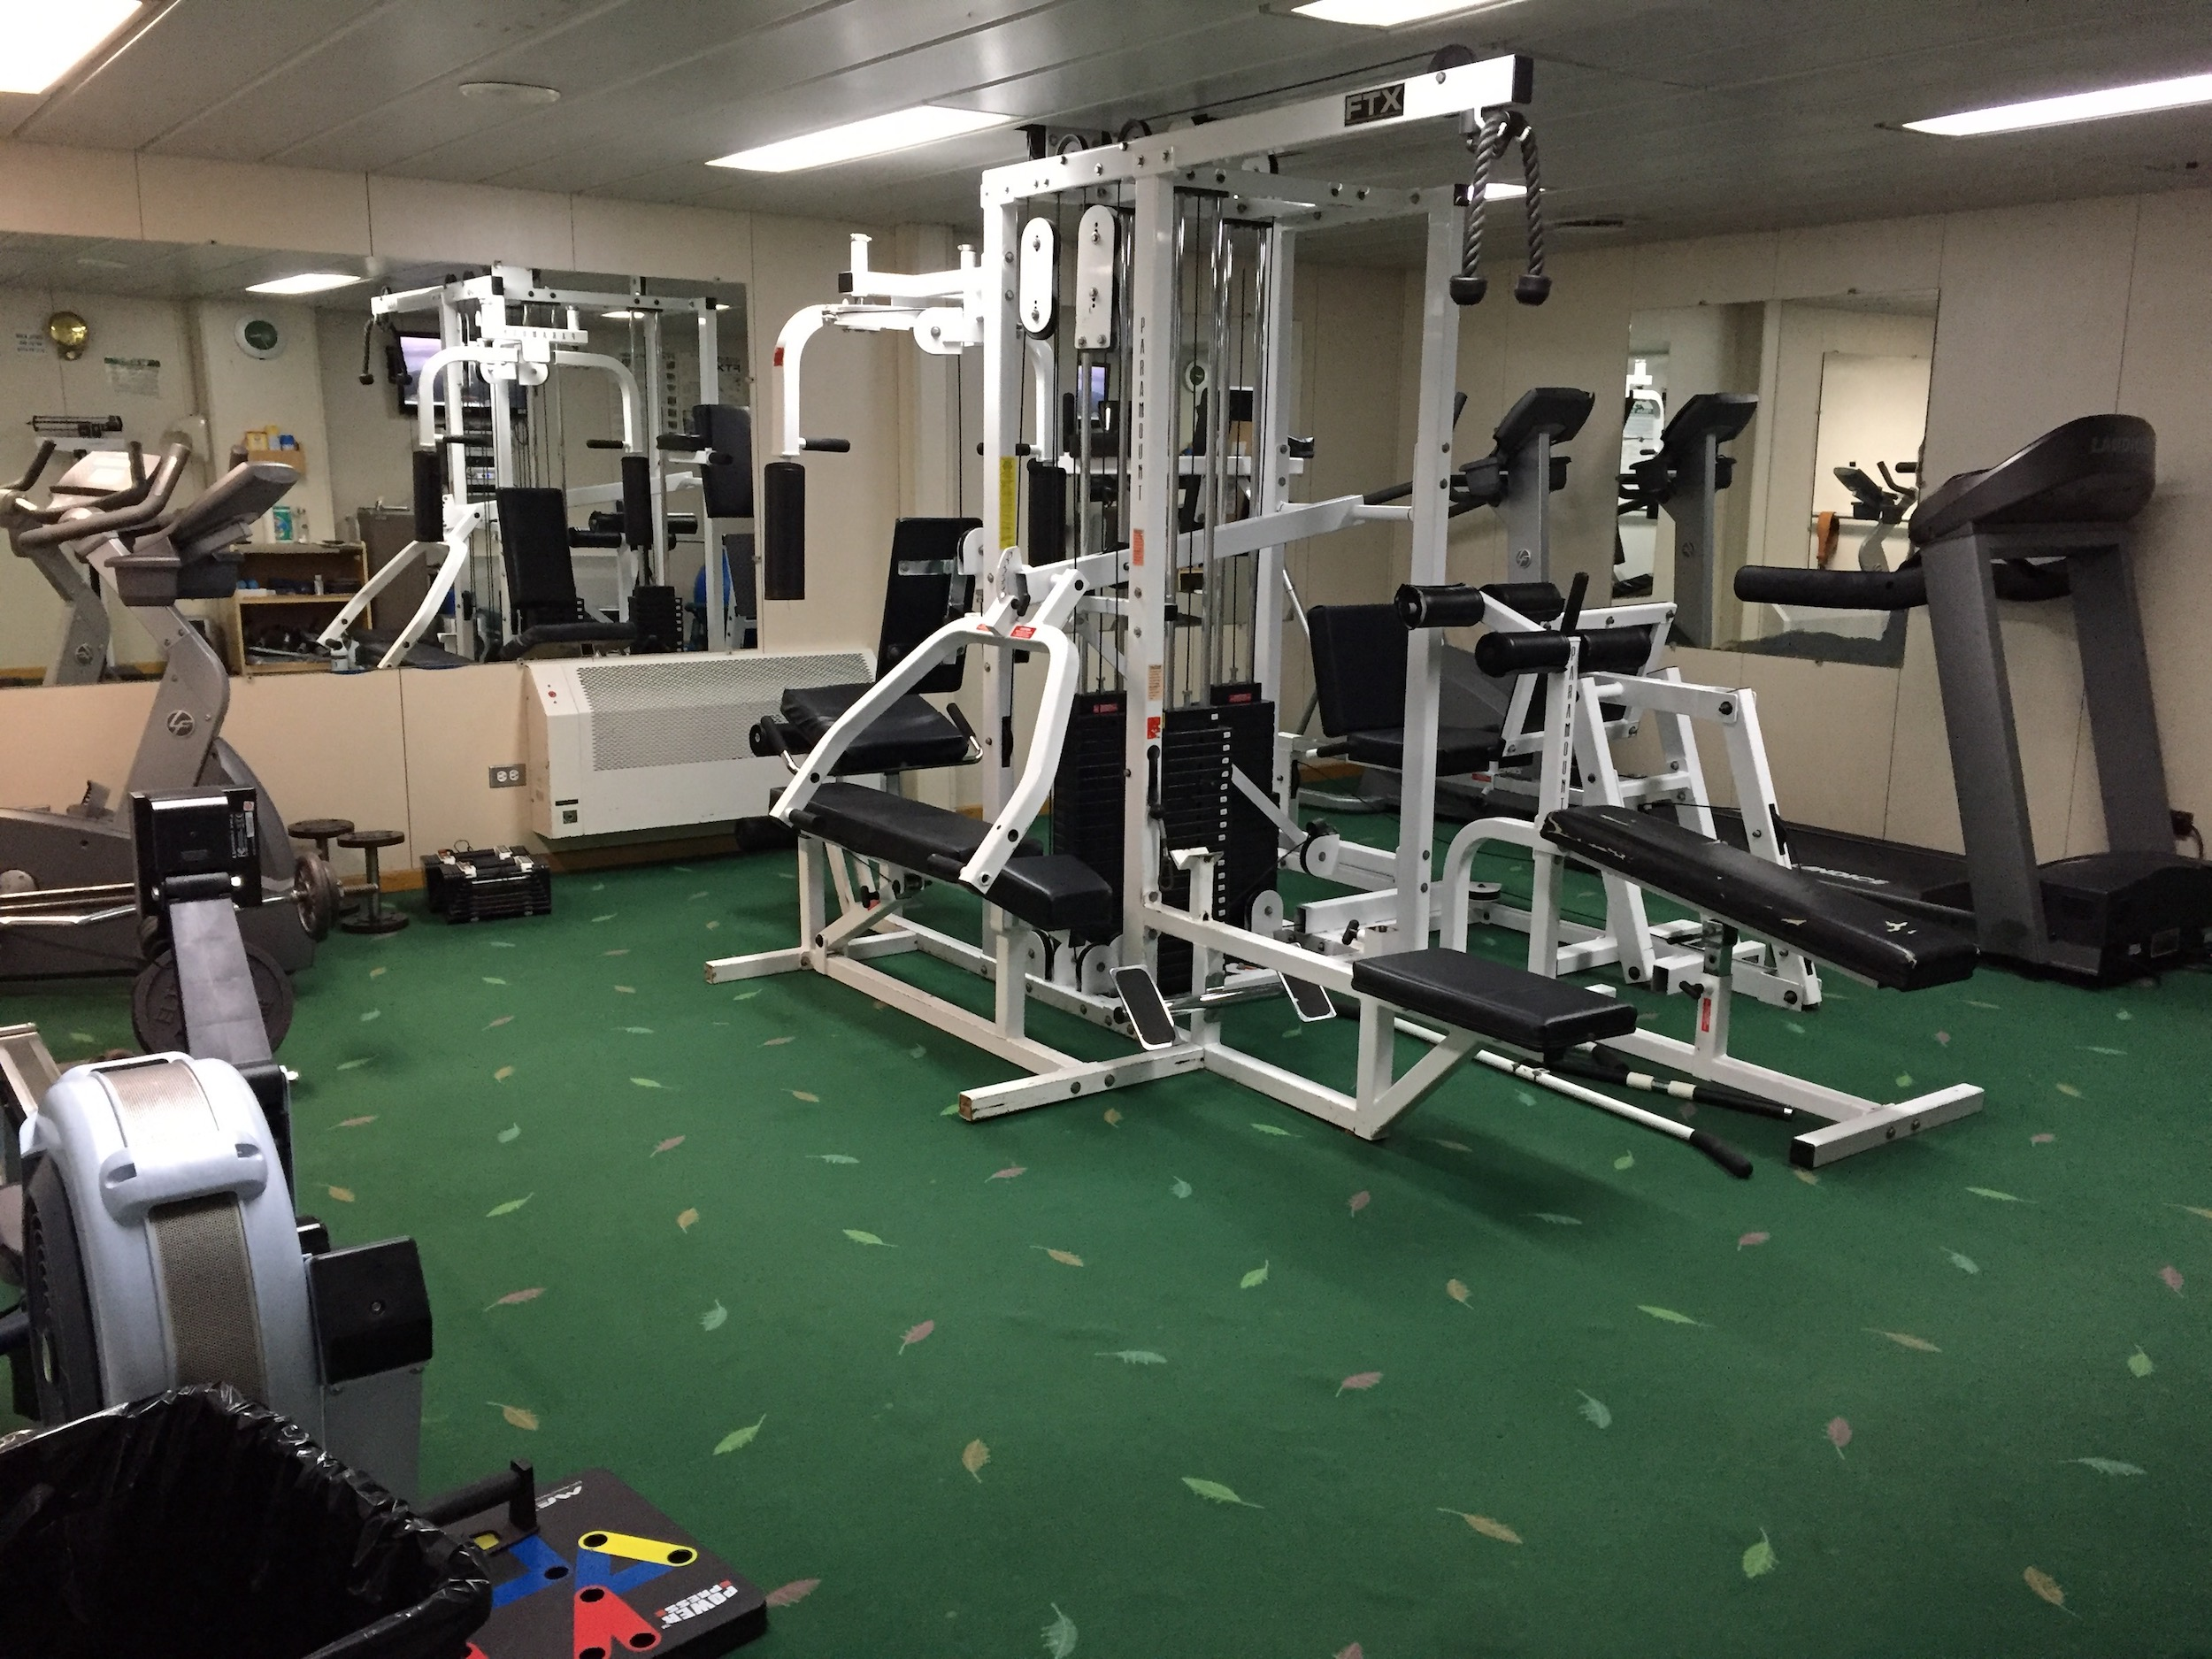 The Palmer's gym